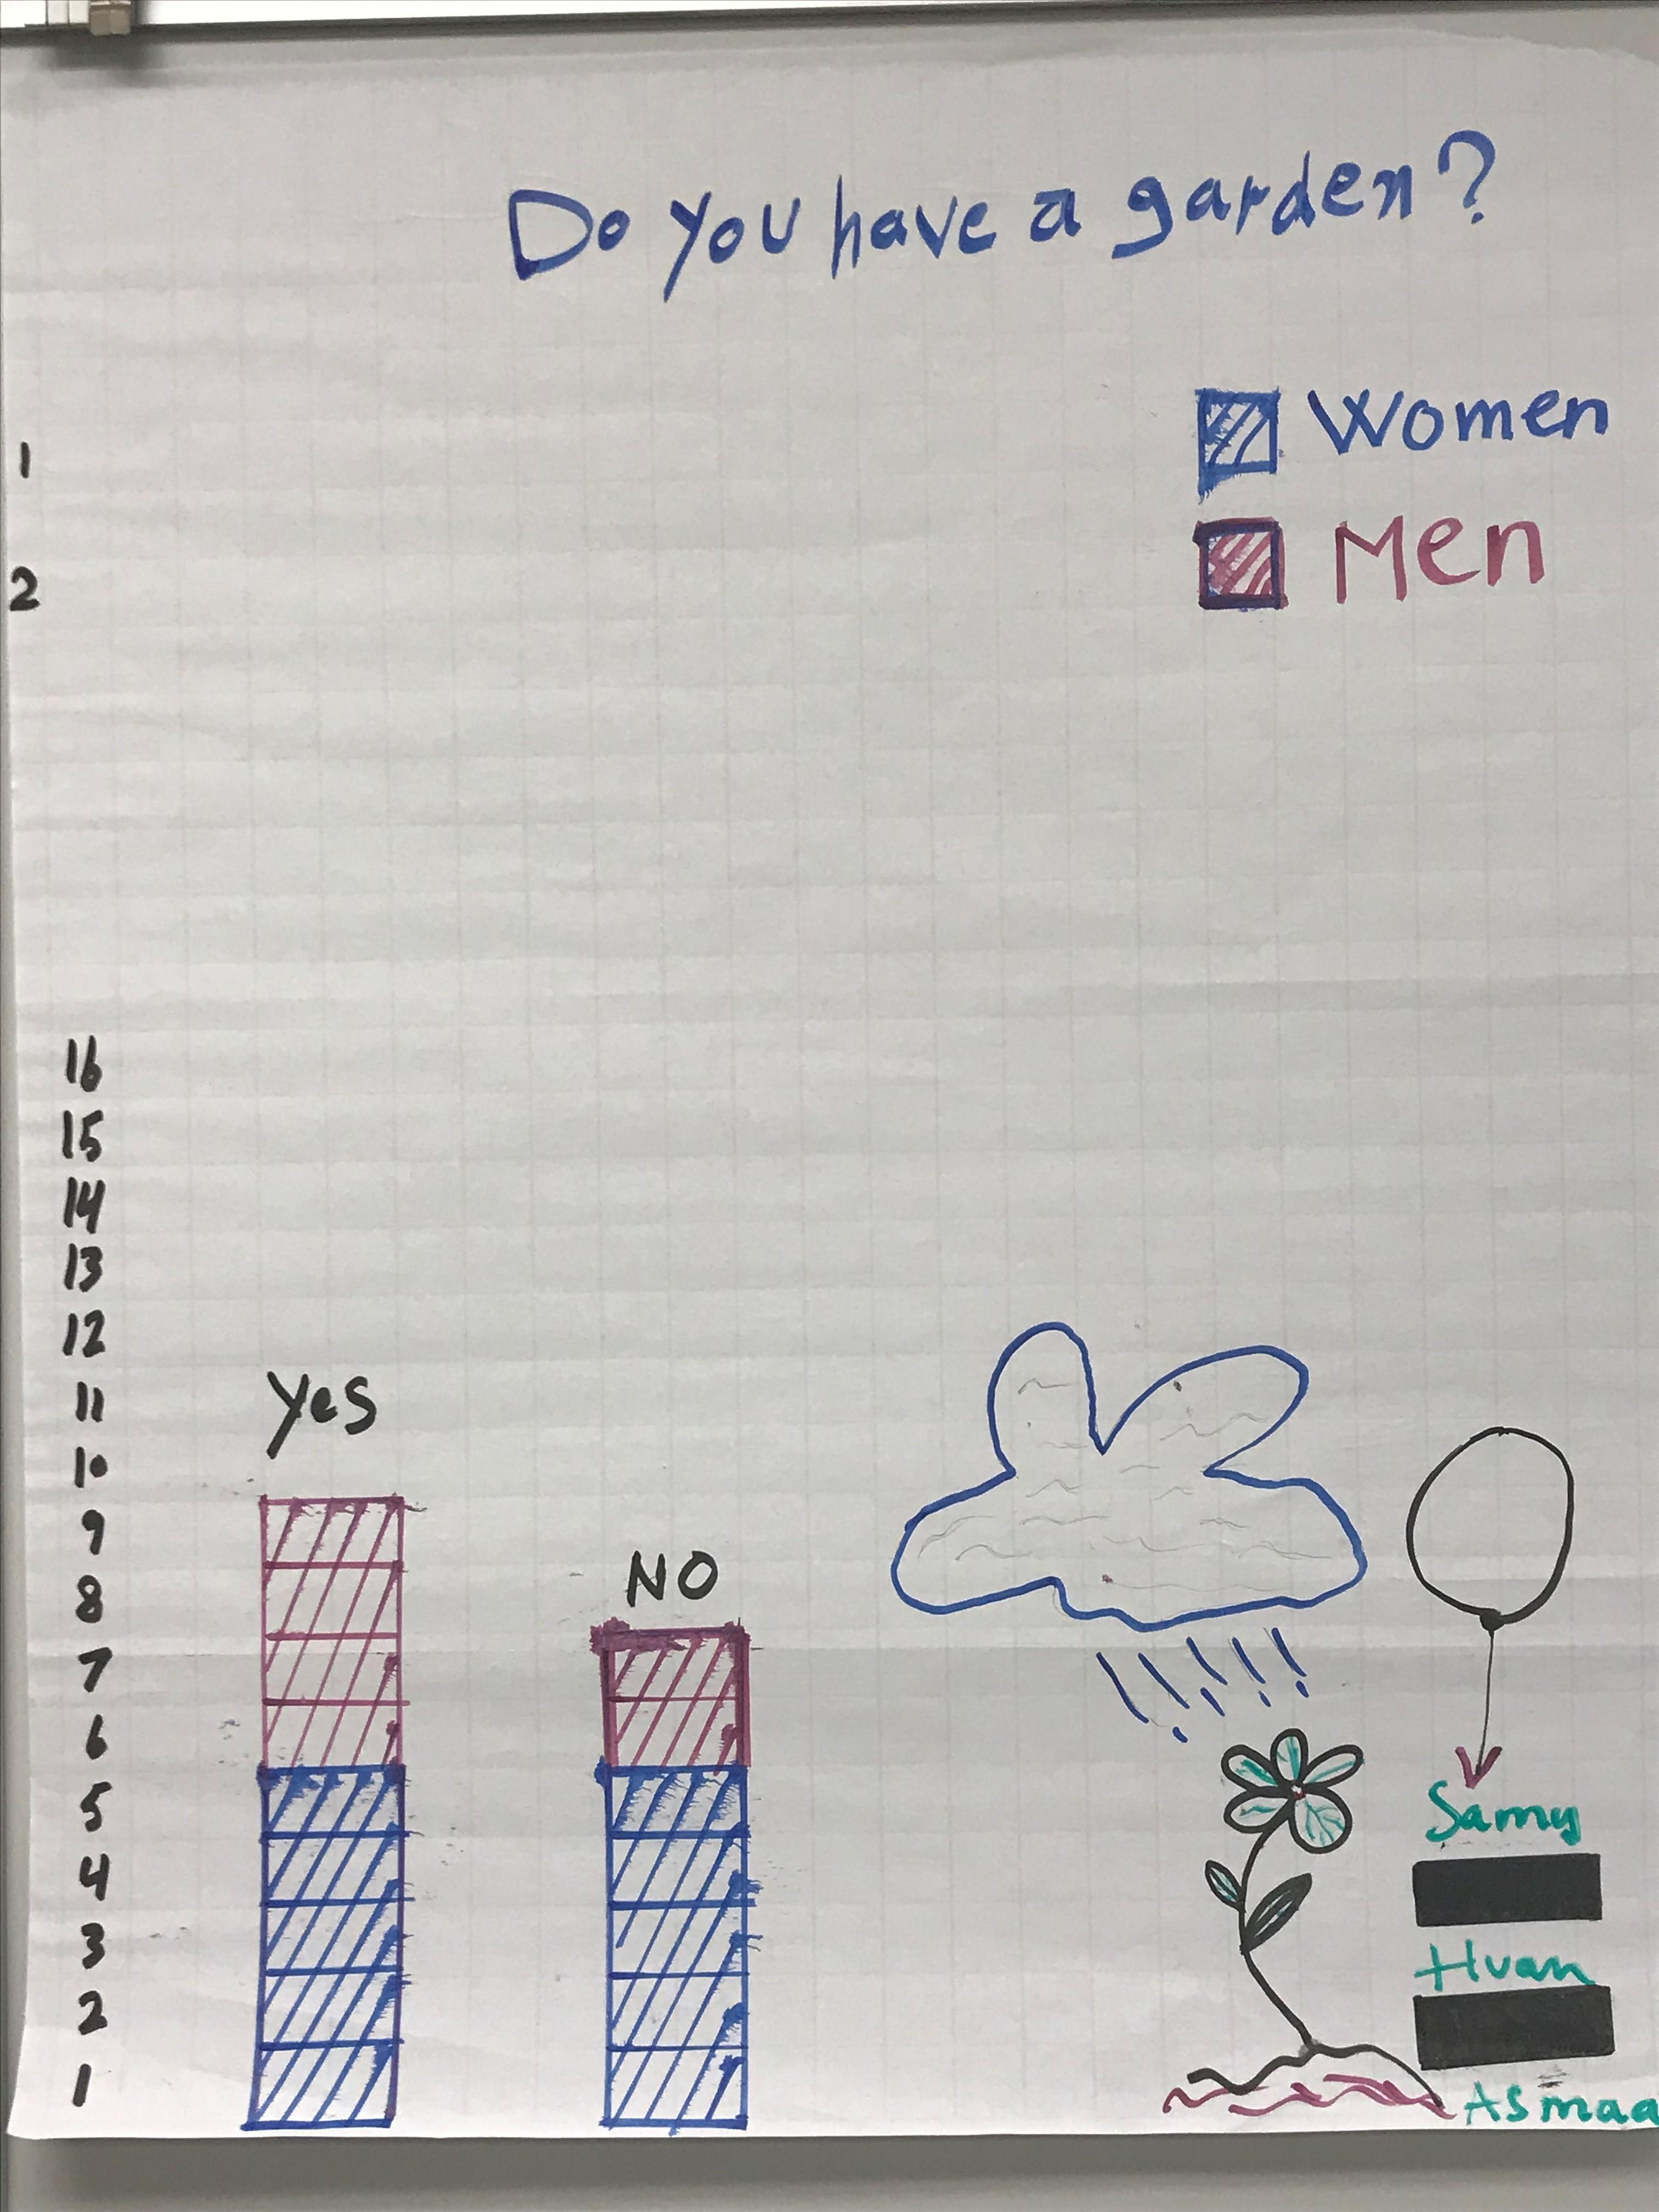 Bar graph shows 9 students (5 women, 4 men) have a garden. Seven students  (5 women and 2 men) do not have a graden.